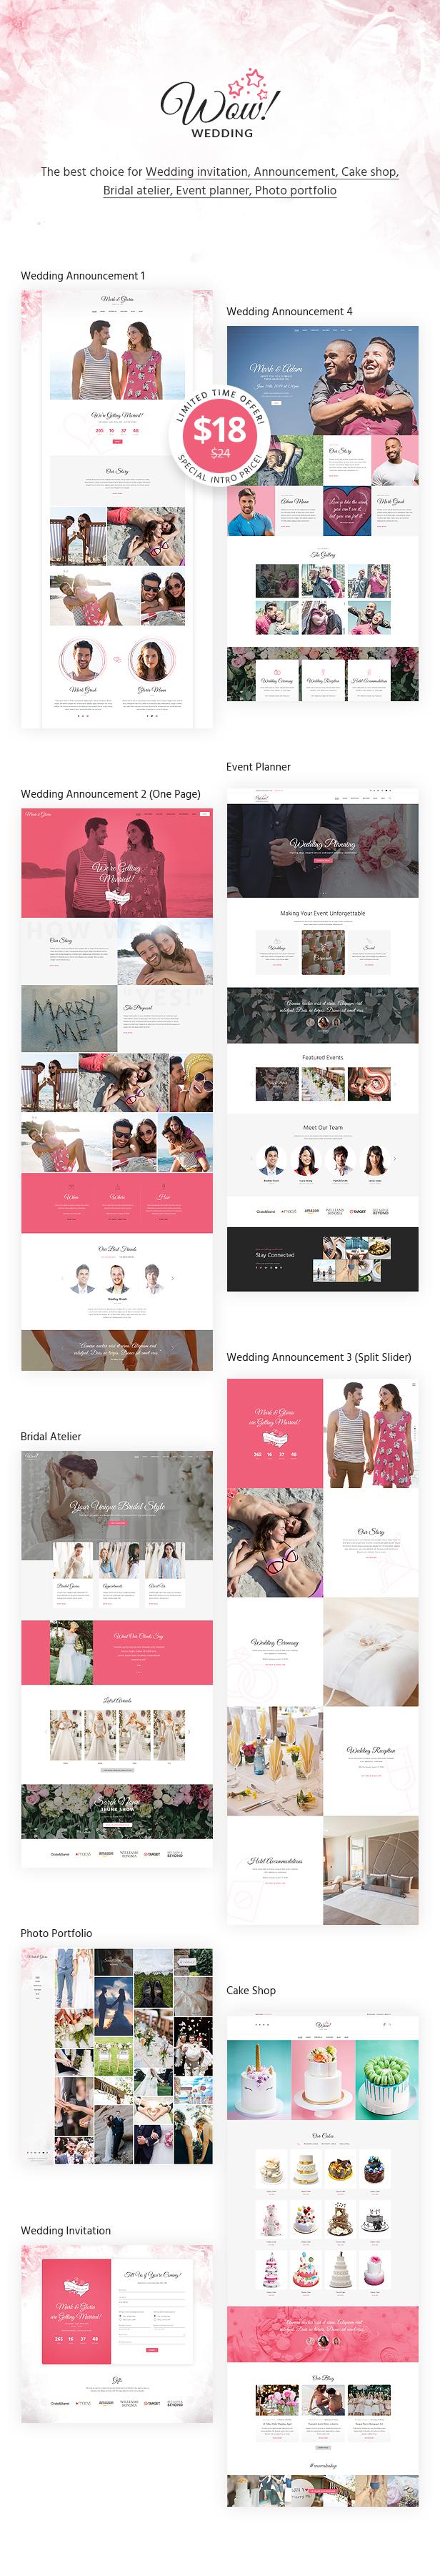 WoWedding - Wedding Oriented HTML Website Template - 1